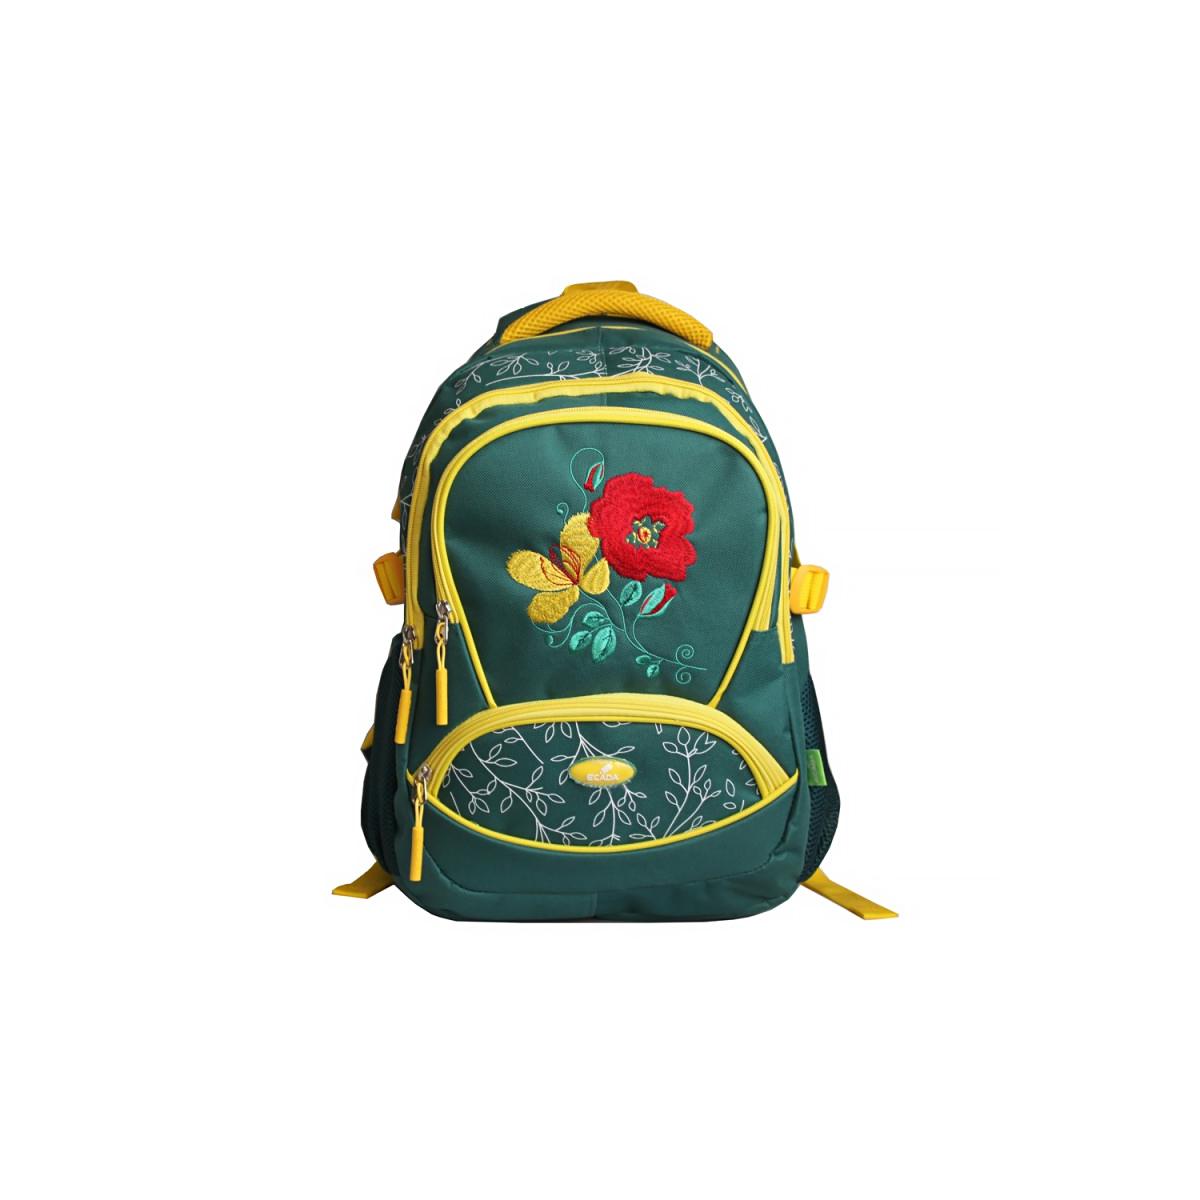 Ghiozdan Școlar Pentru Adolescenți, 46 Centimetri, Verde, Flori, Ecada, 61715